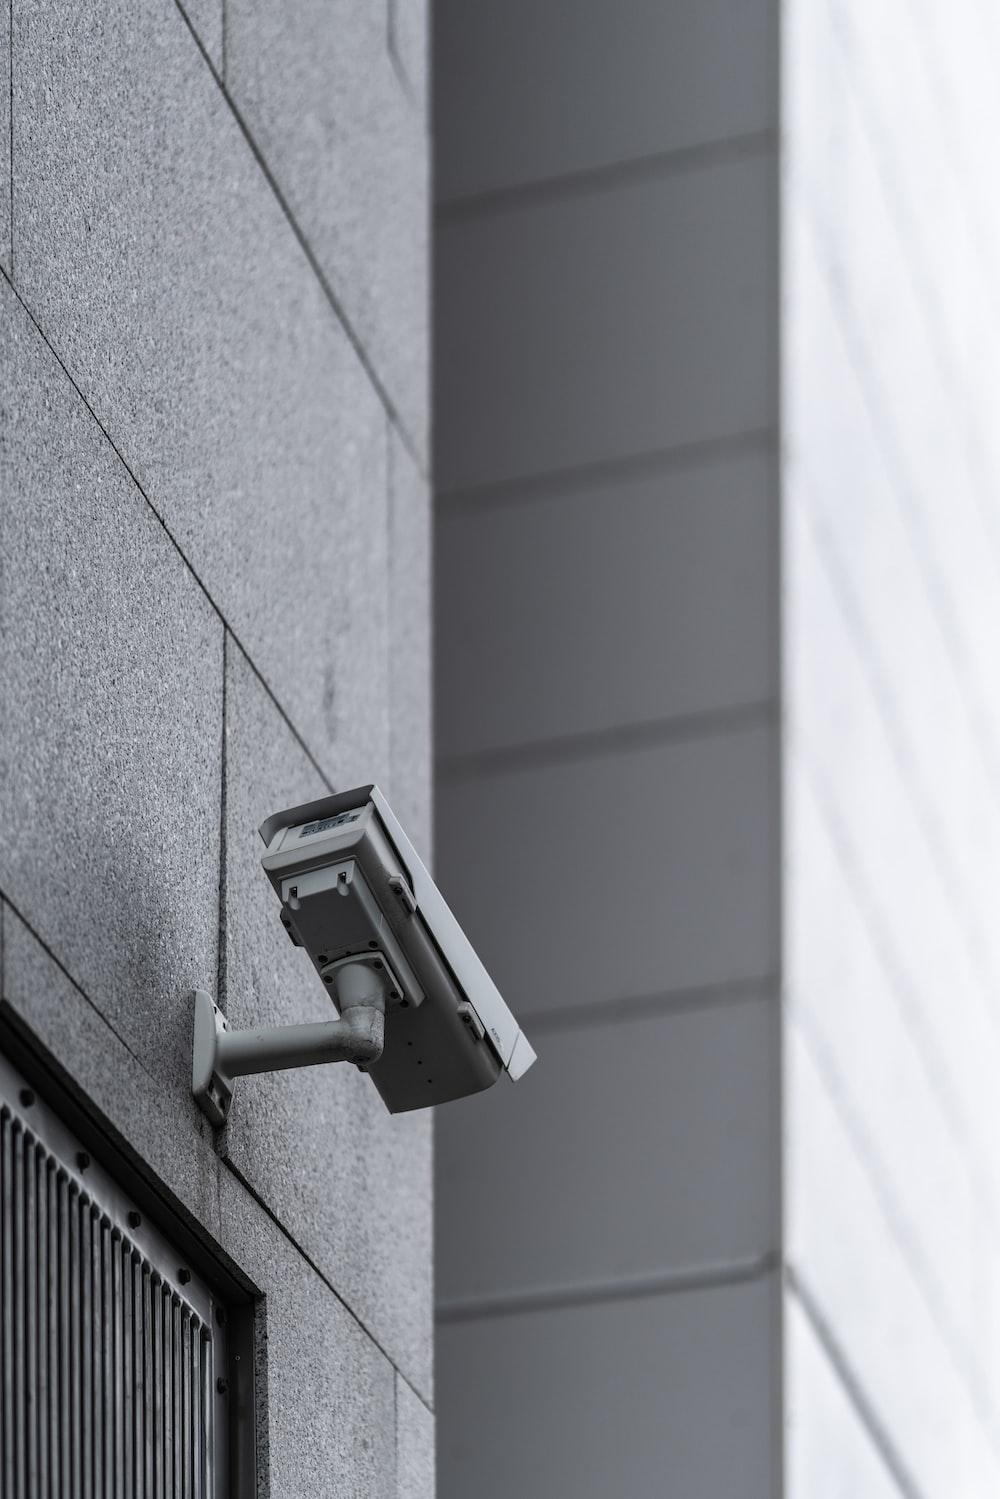 gray surveillance camera